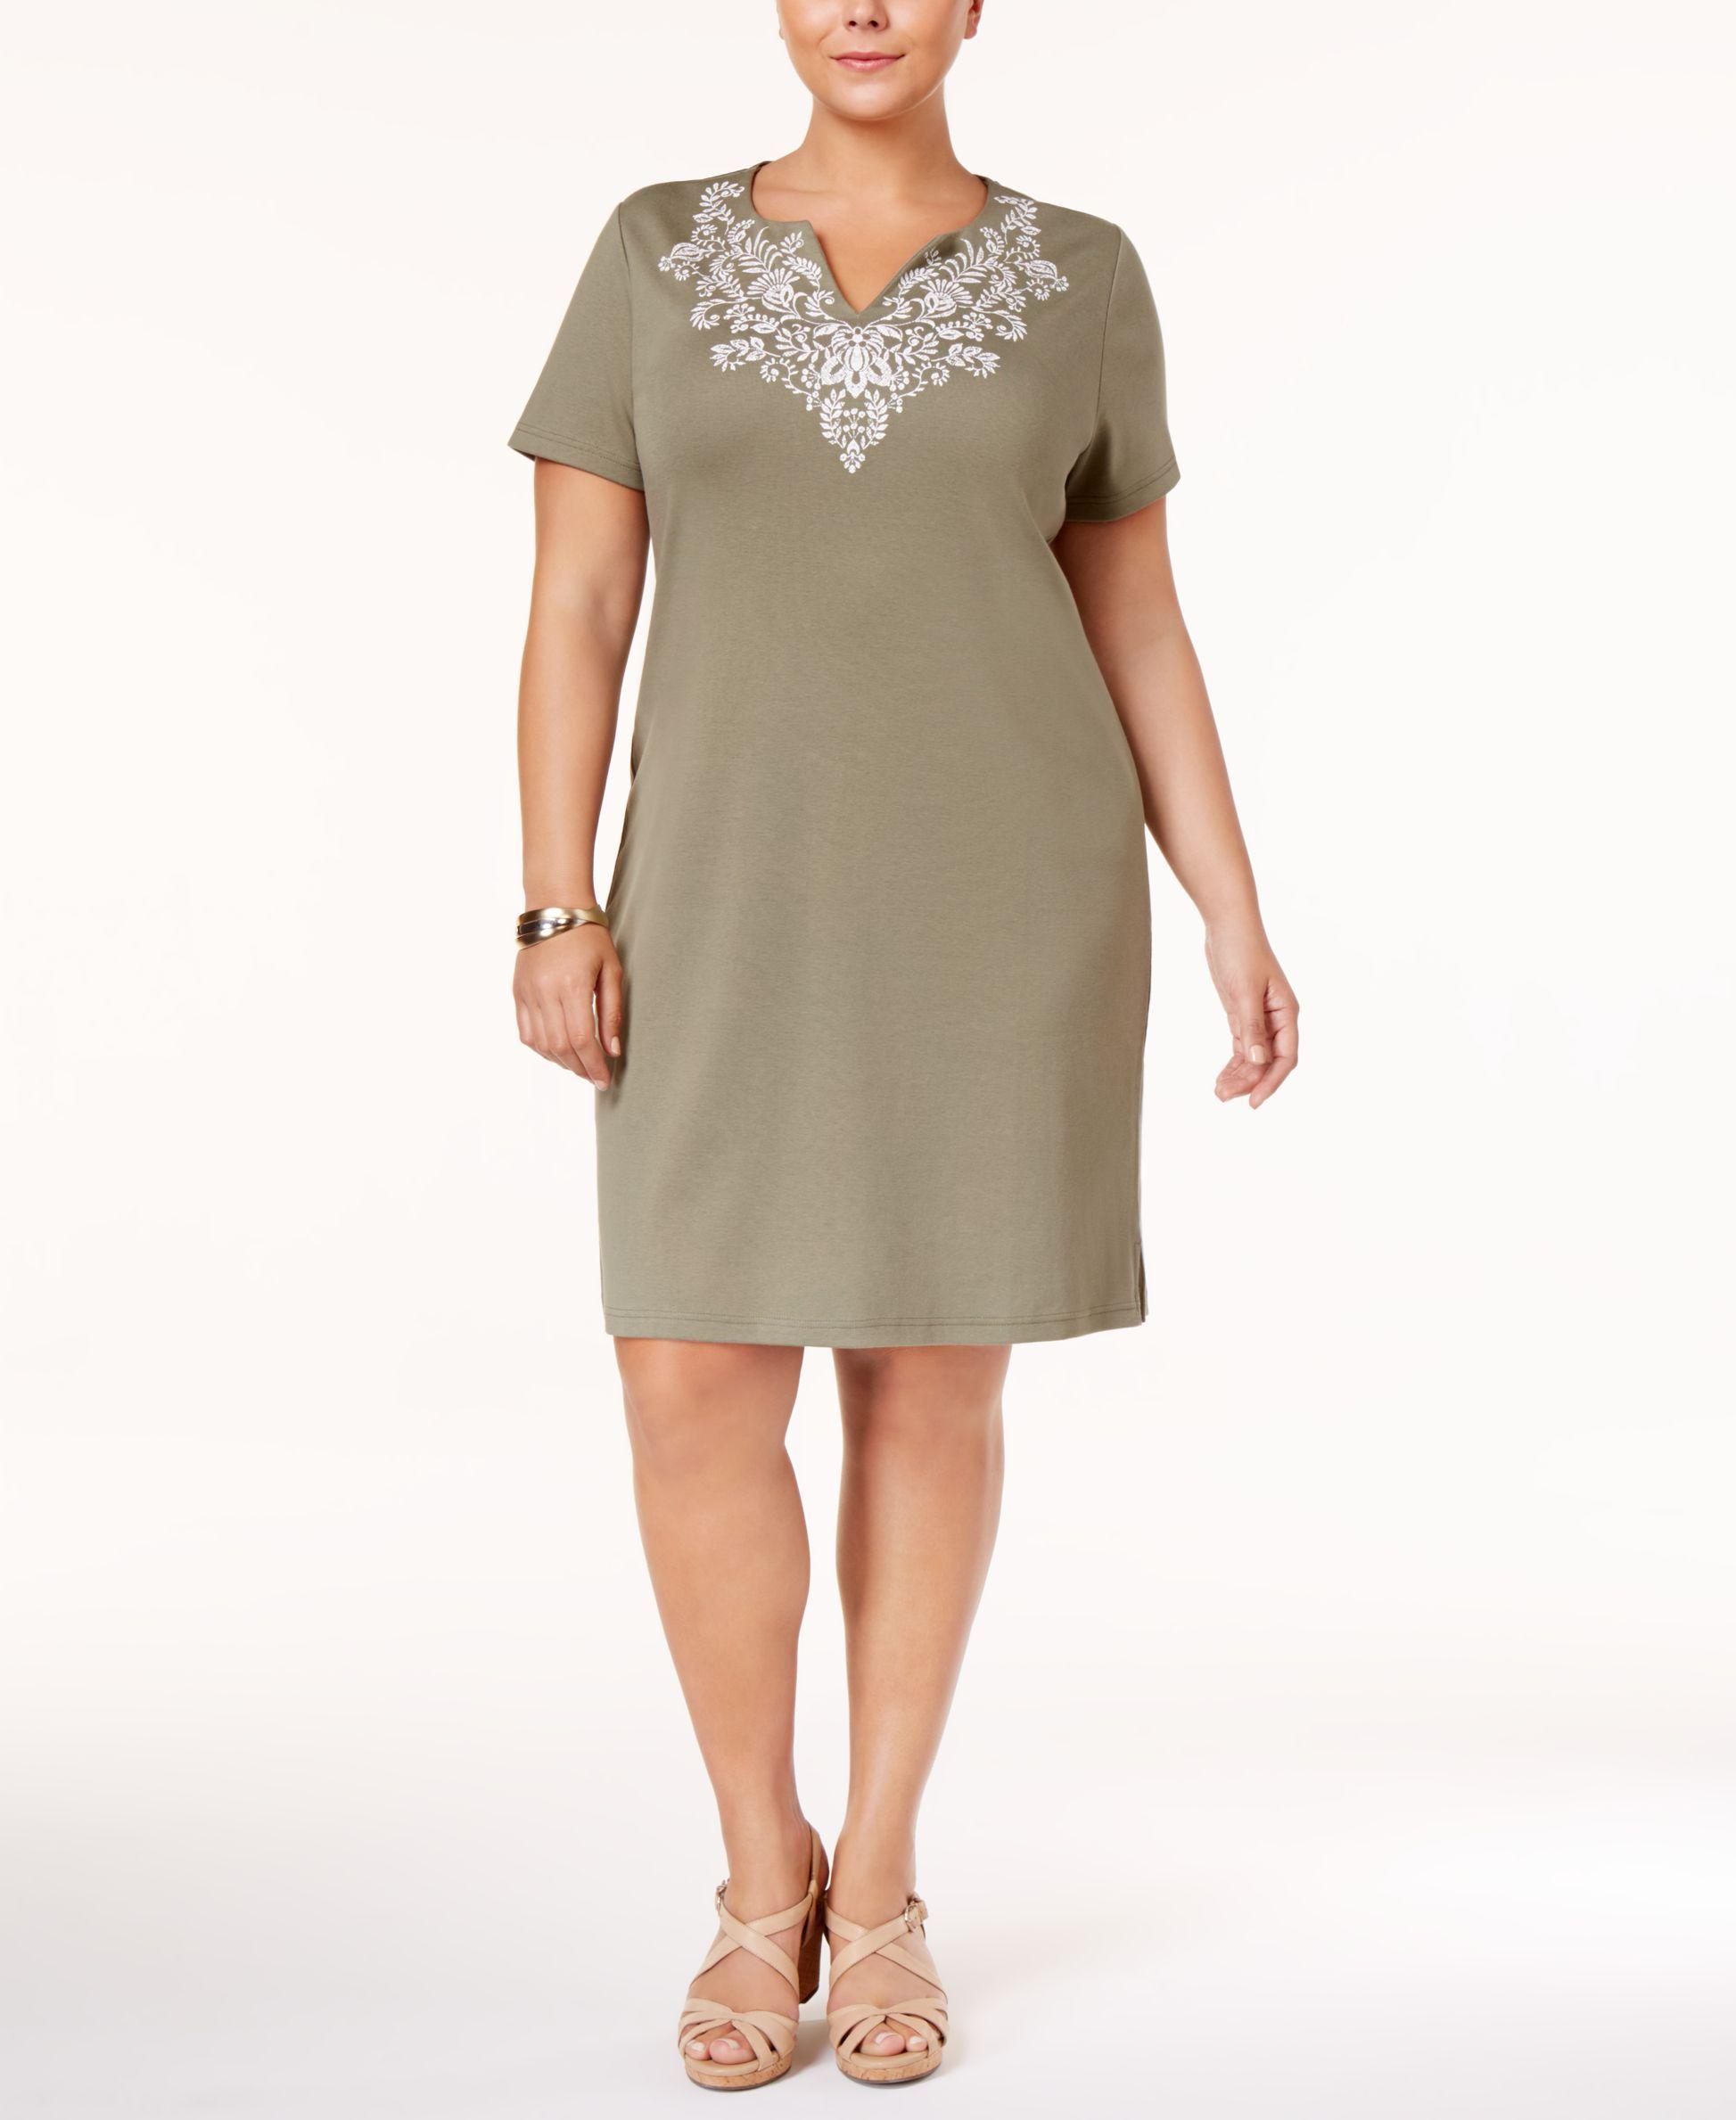 ea2b60f8fe049 Karen Scott Plus Size Cotton Embroidered T-Shirt Dress